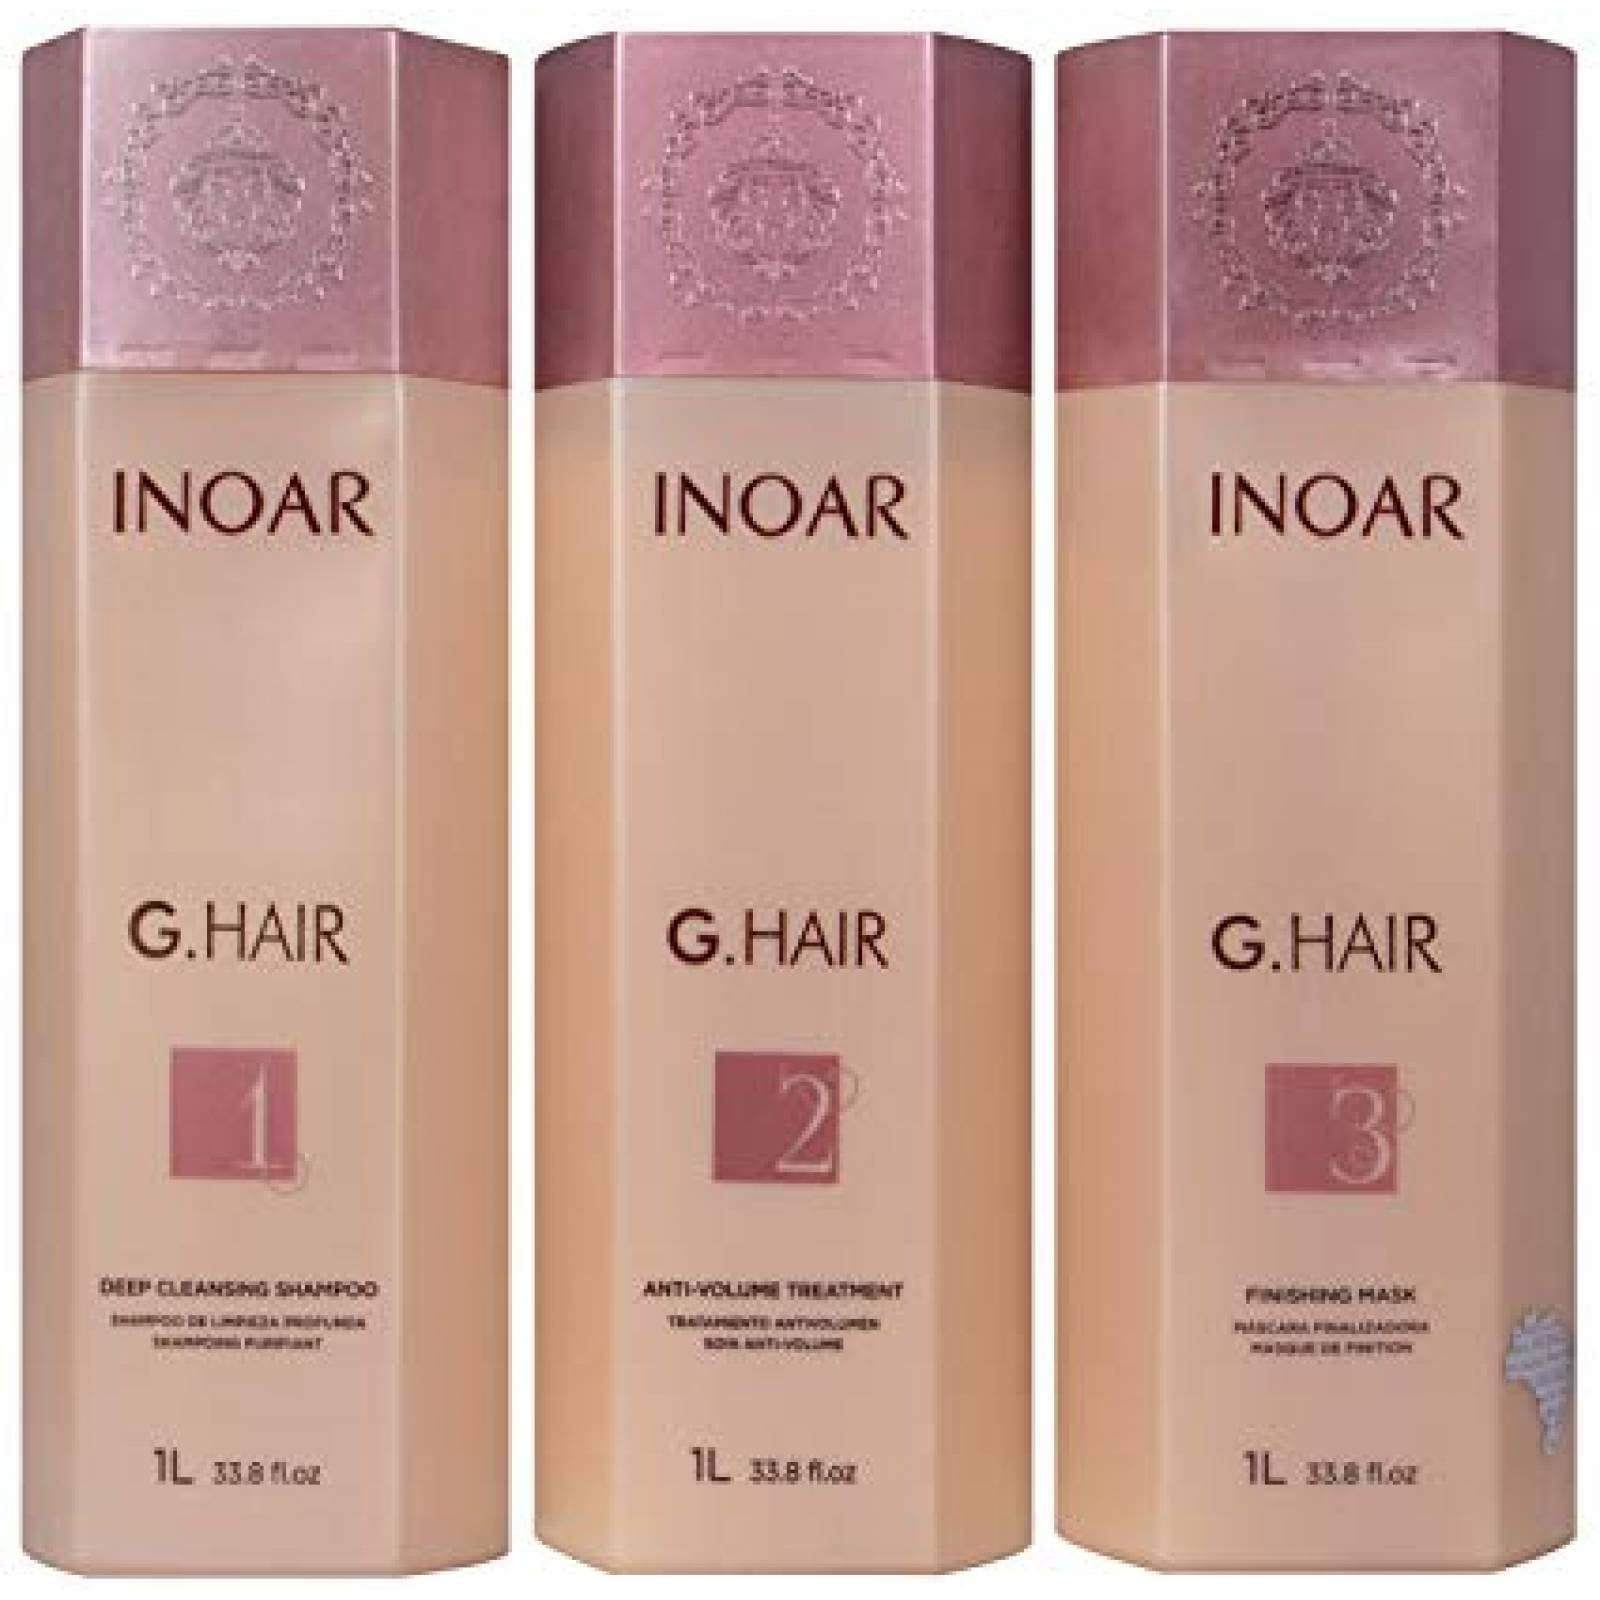 Kit Keratina Alemana 3 pasos Inoar G Hair 1 lt. Shampoo, Anti Volumen y mascara finalizadora